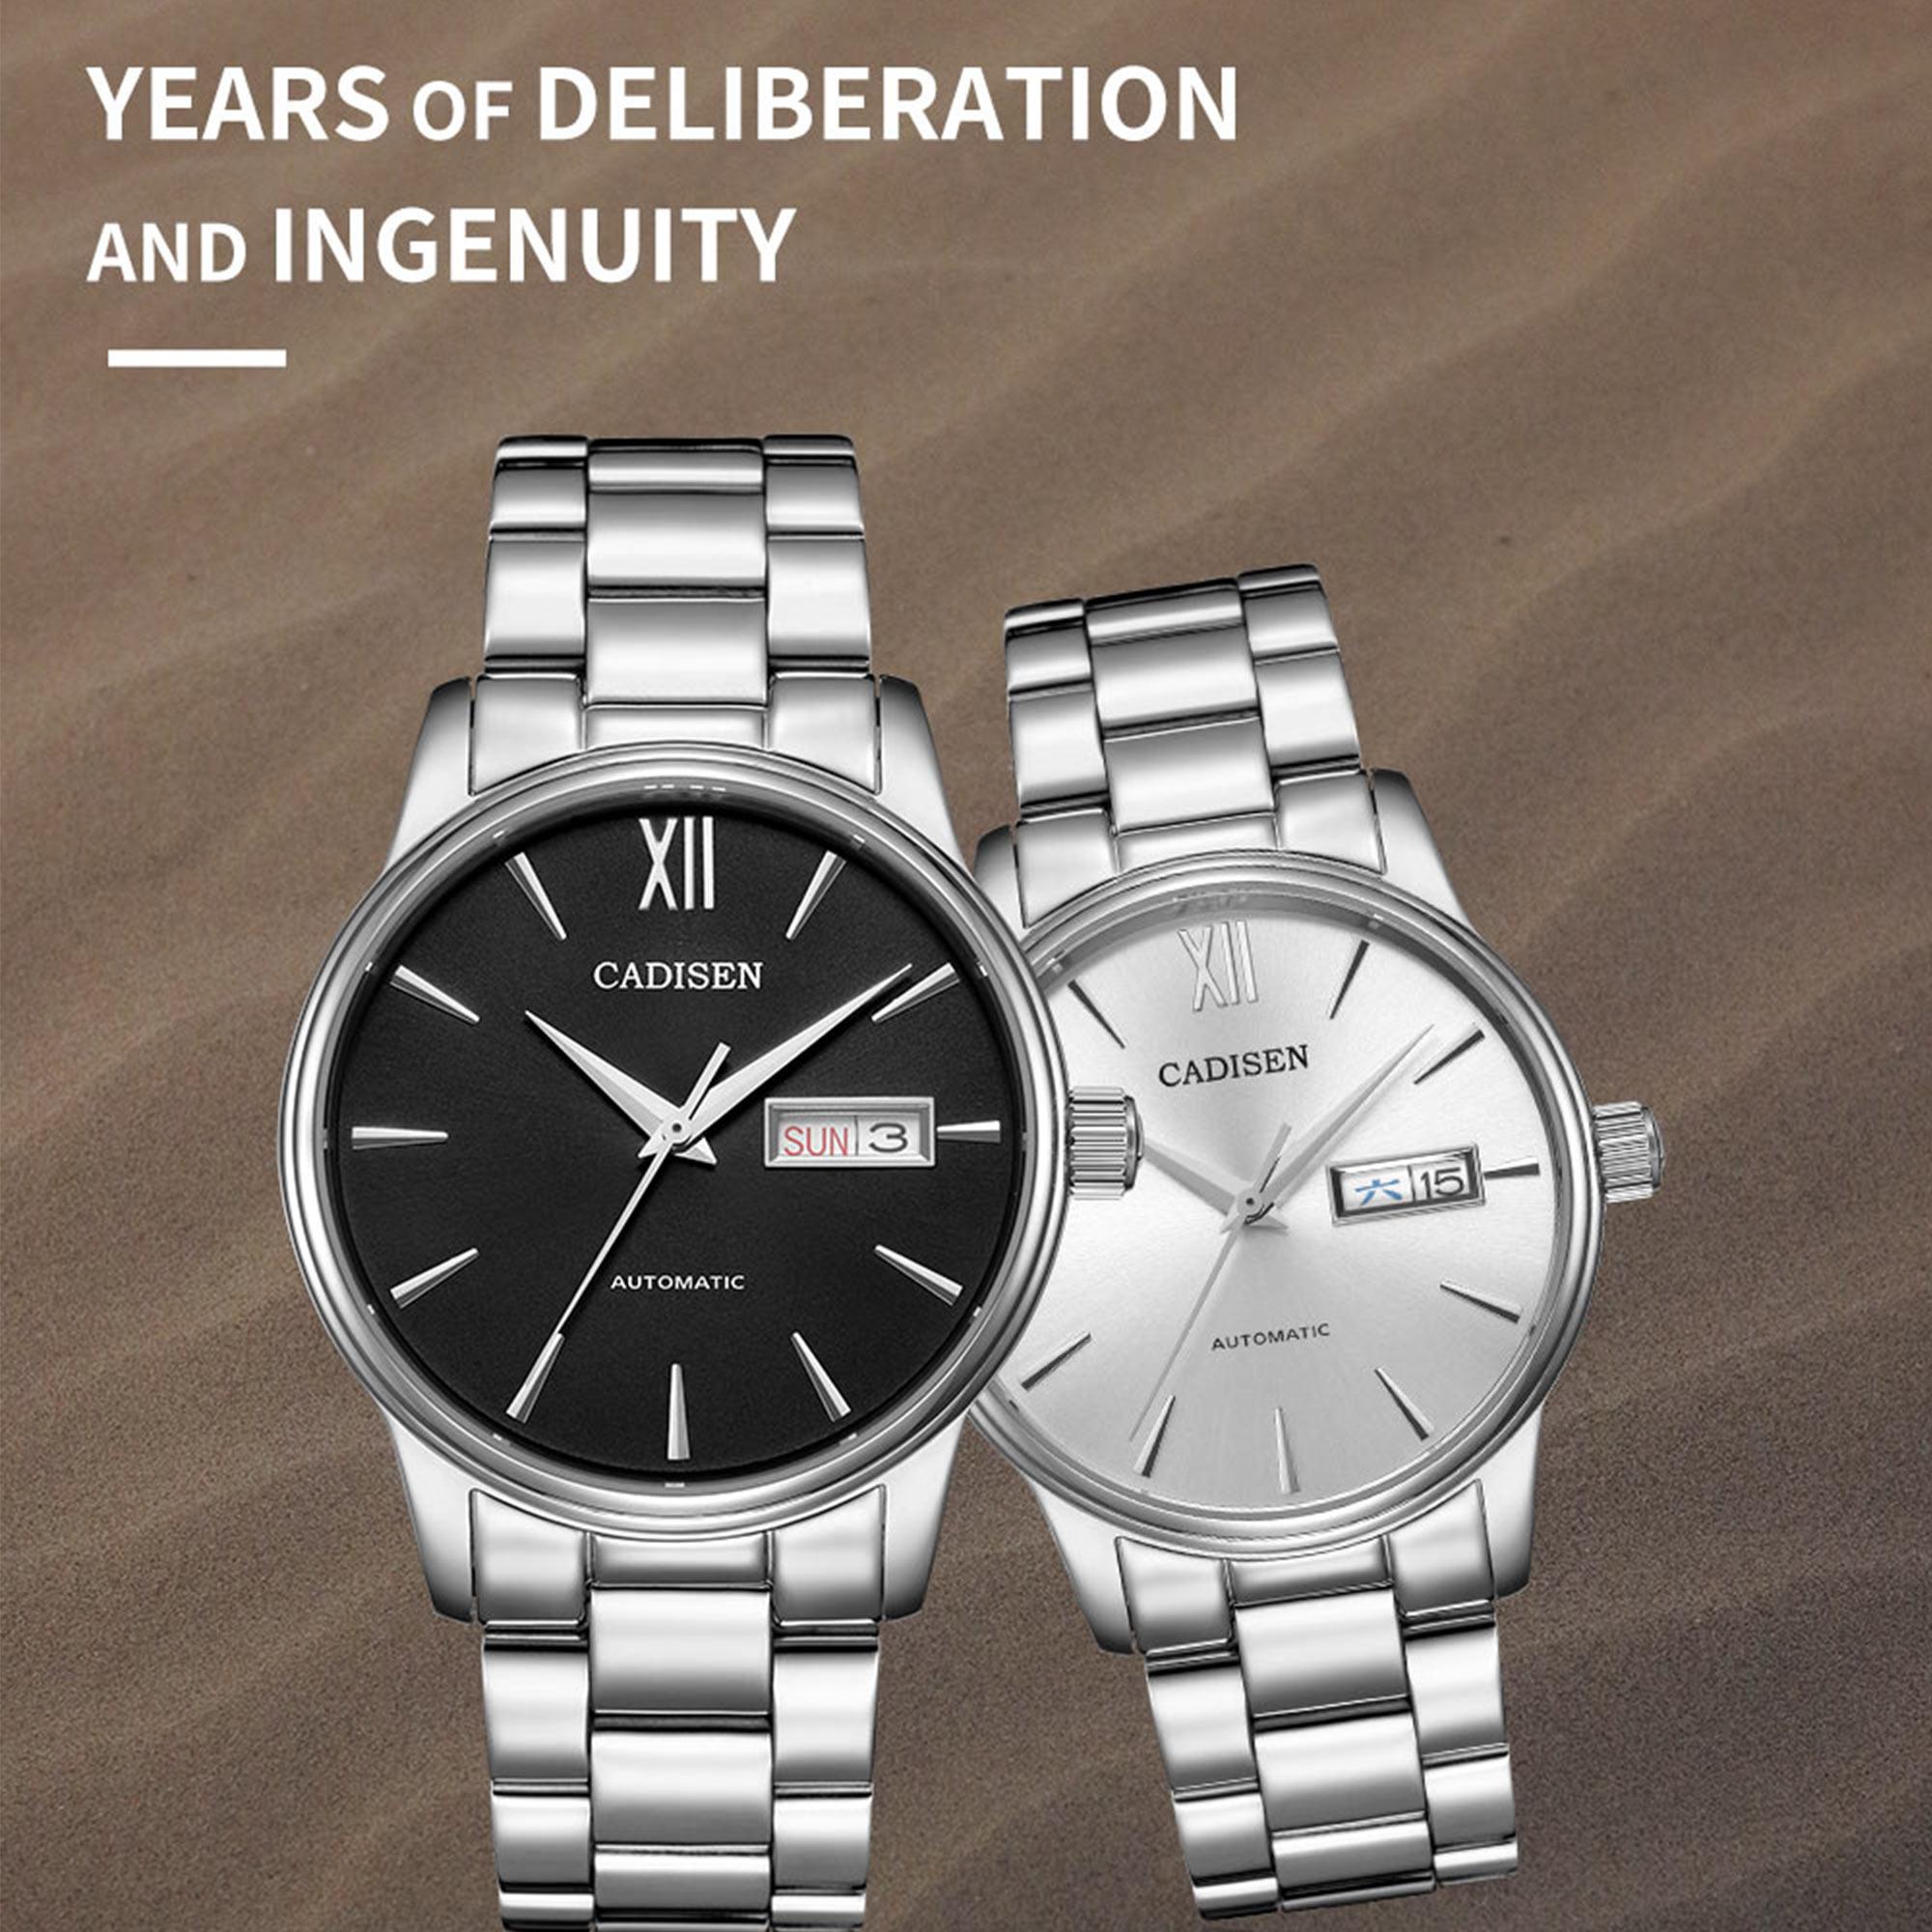 H29938819beda47c1ad5dd71cc4fe9cedA CADISEN Men Watch Automatic Mechanical Watches Role Date Week Top Luxury Brand Japan NH36A Wrist watch Clock Relogio Masculino